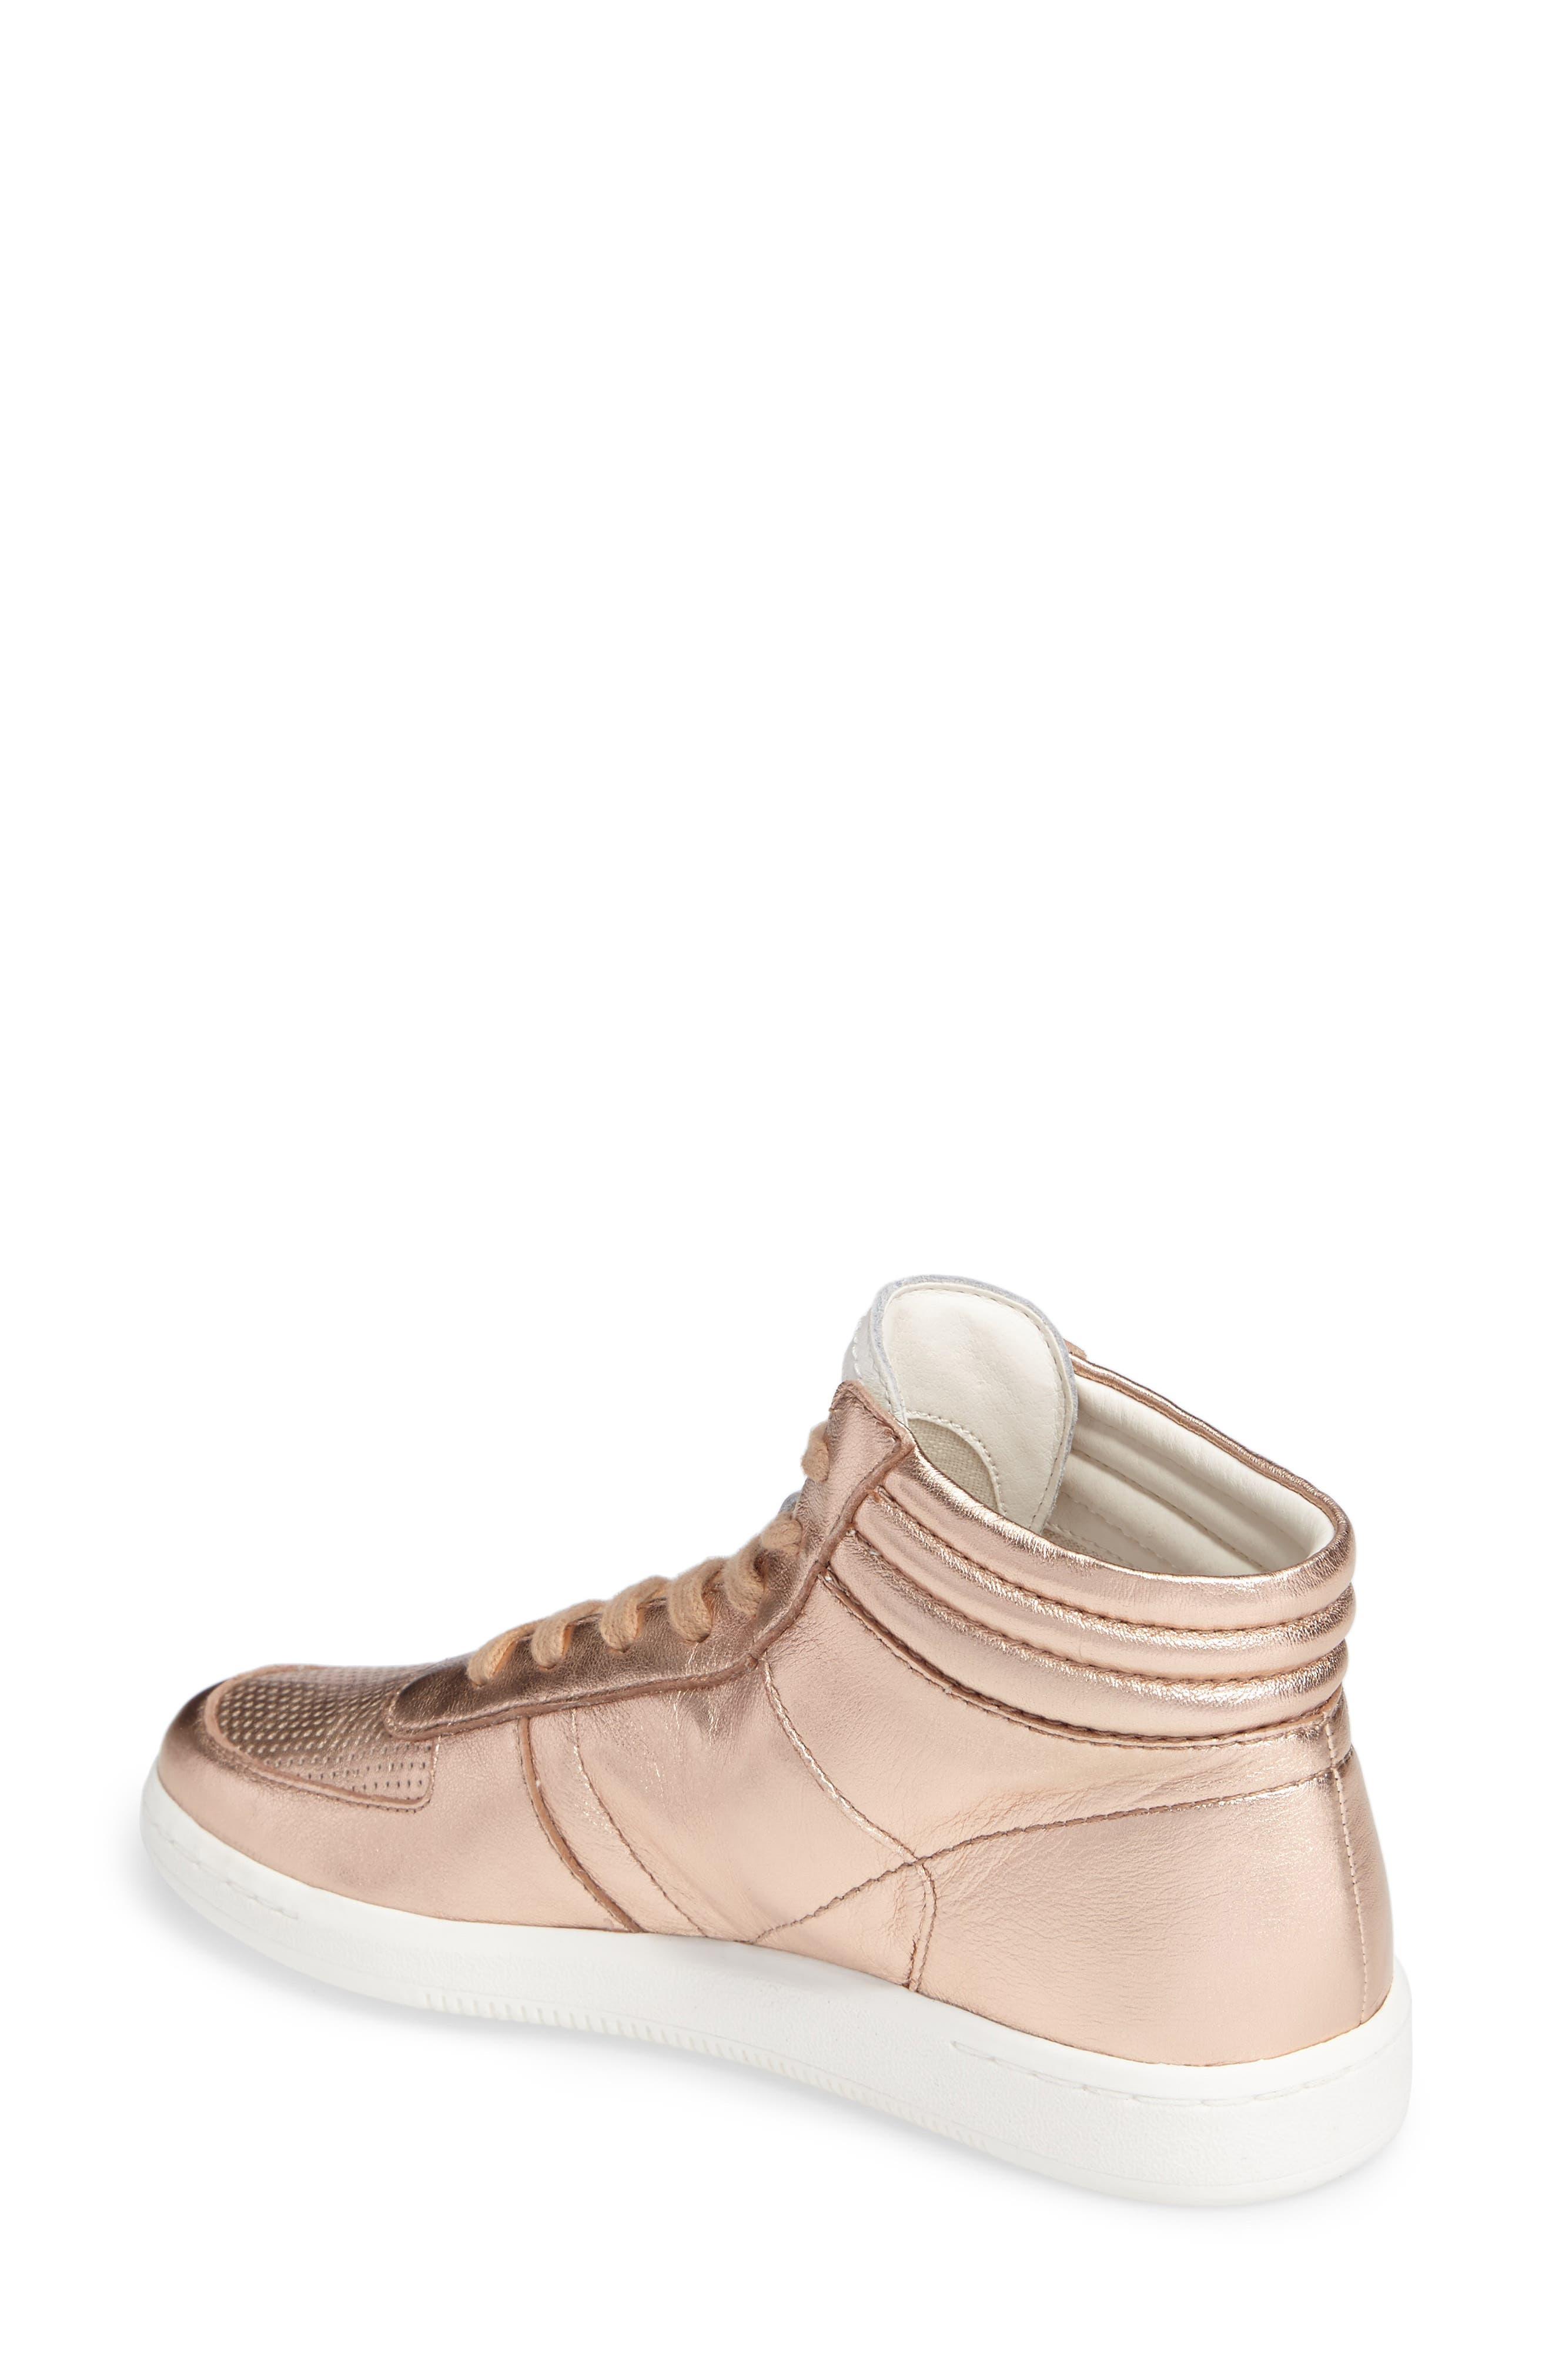 Alternate Image 2  - Dolce Vita Nate High Top Sneaker (Women)